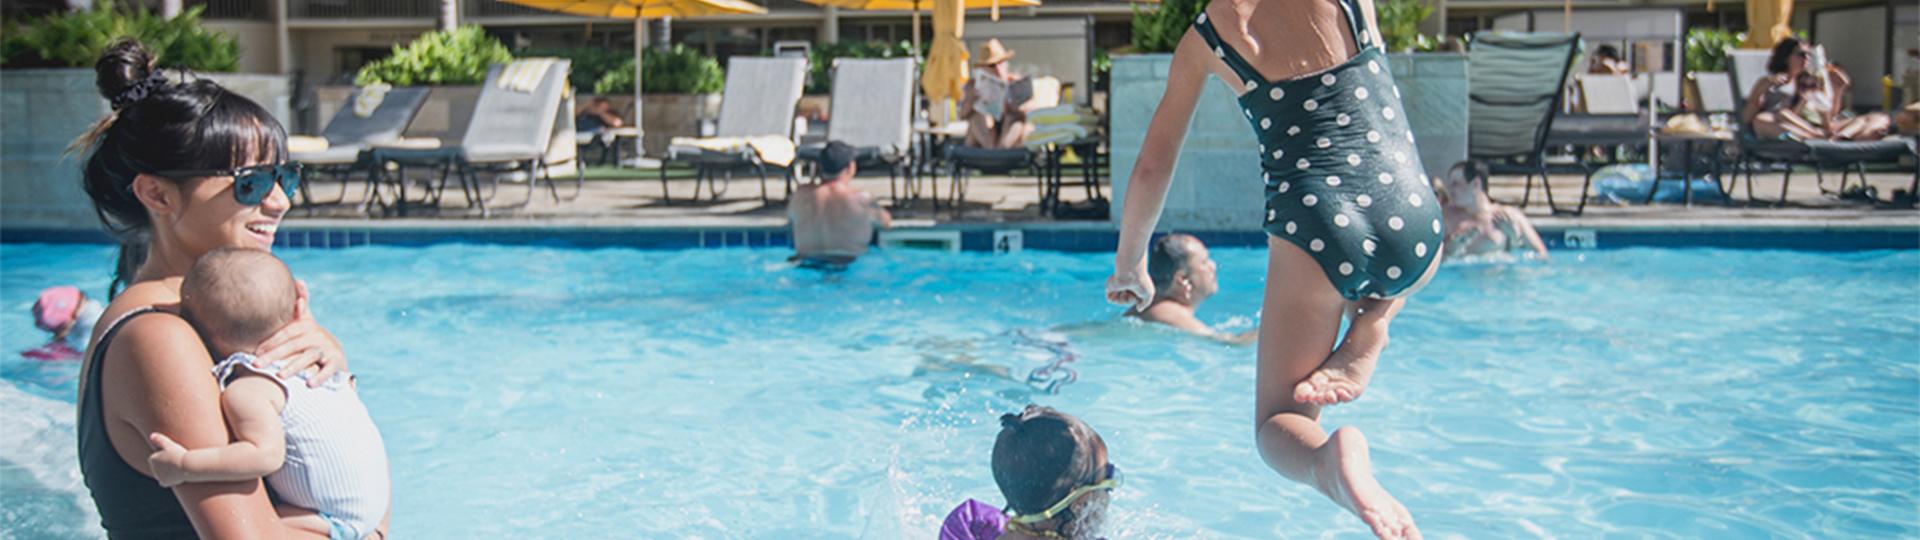 Leisure in Honolulu, Hawaii Hotel